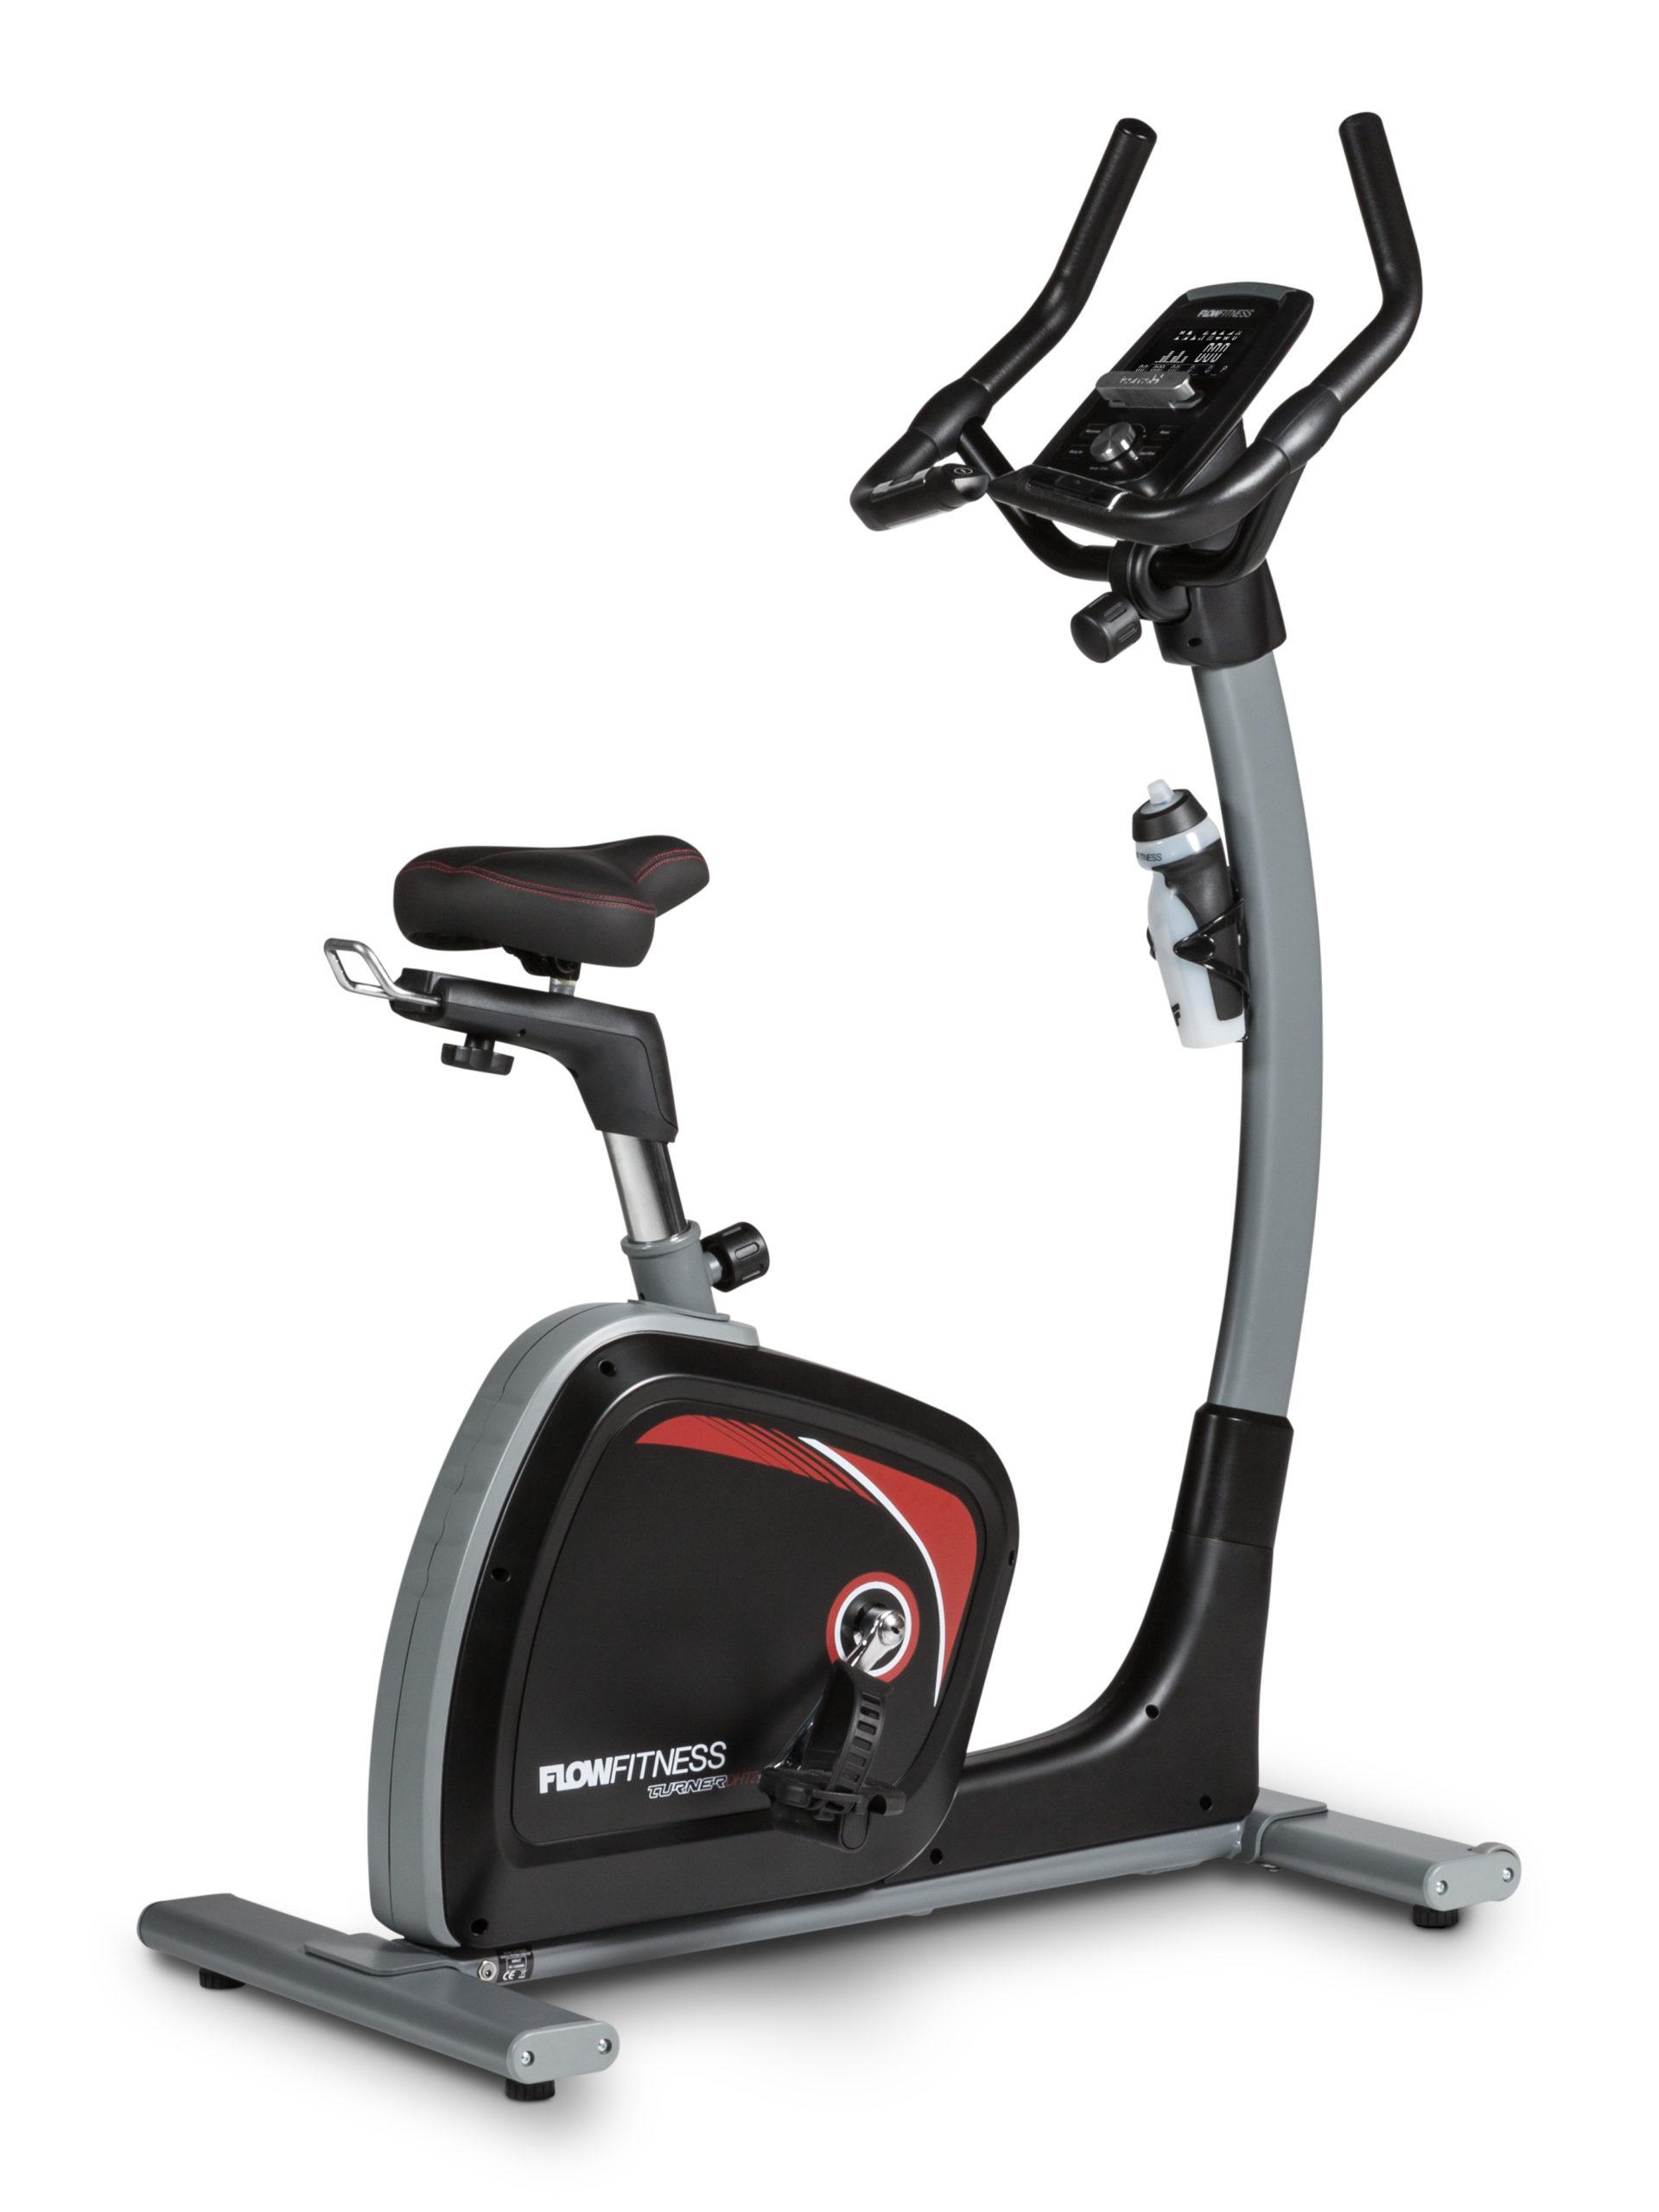 Flow Fitness Tabel Turner DHT2500i Hometrainer 1